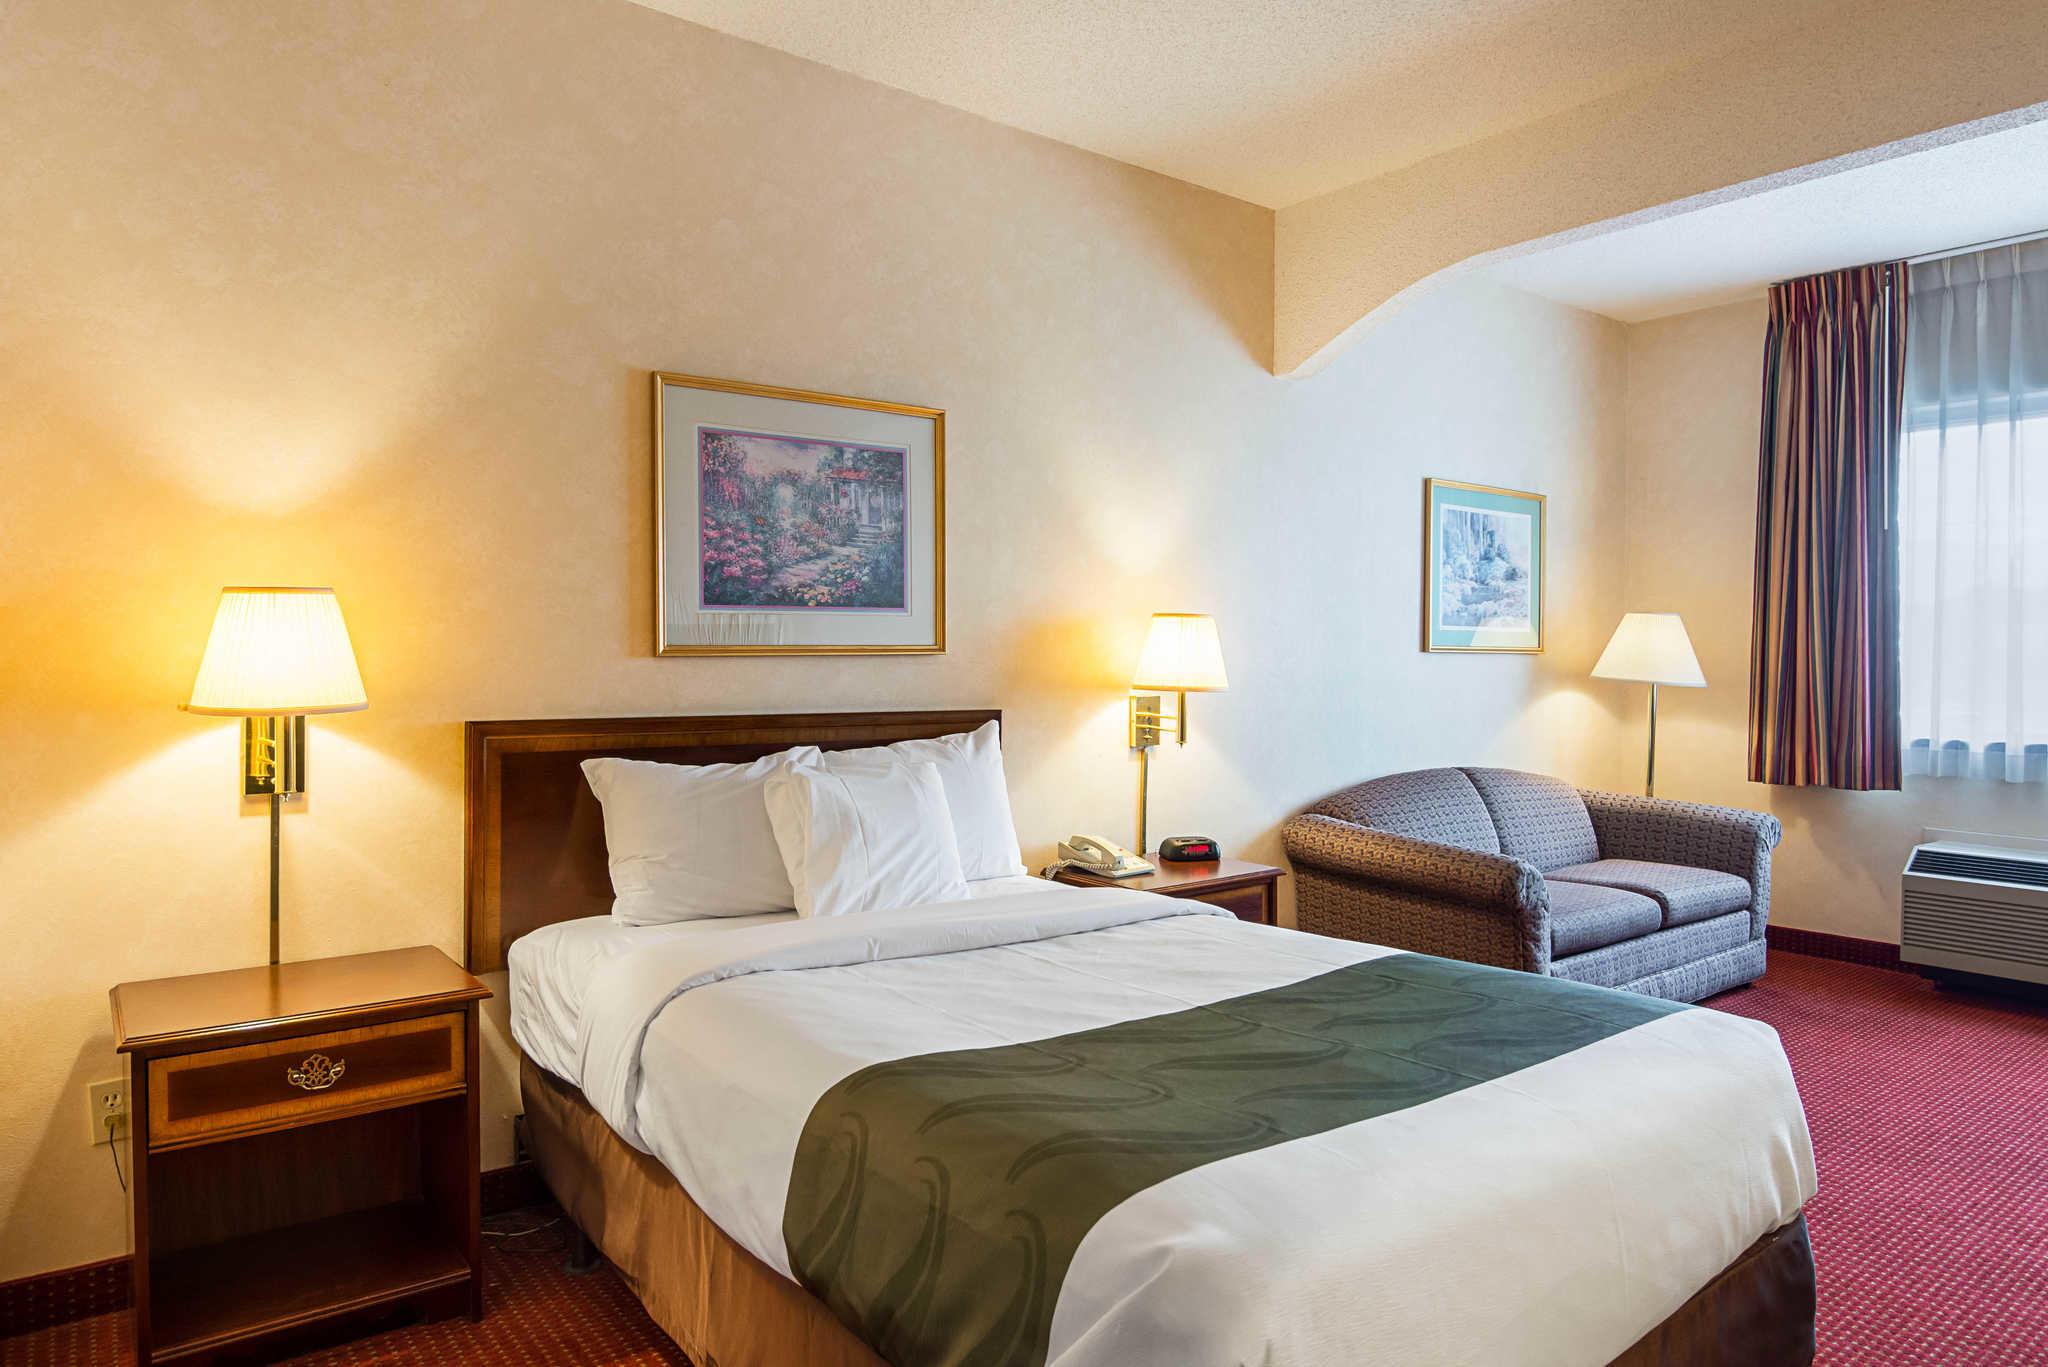 Quality Inn & Suites Kearneysville - Martinsburg image 11